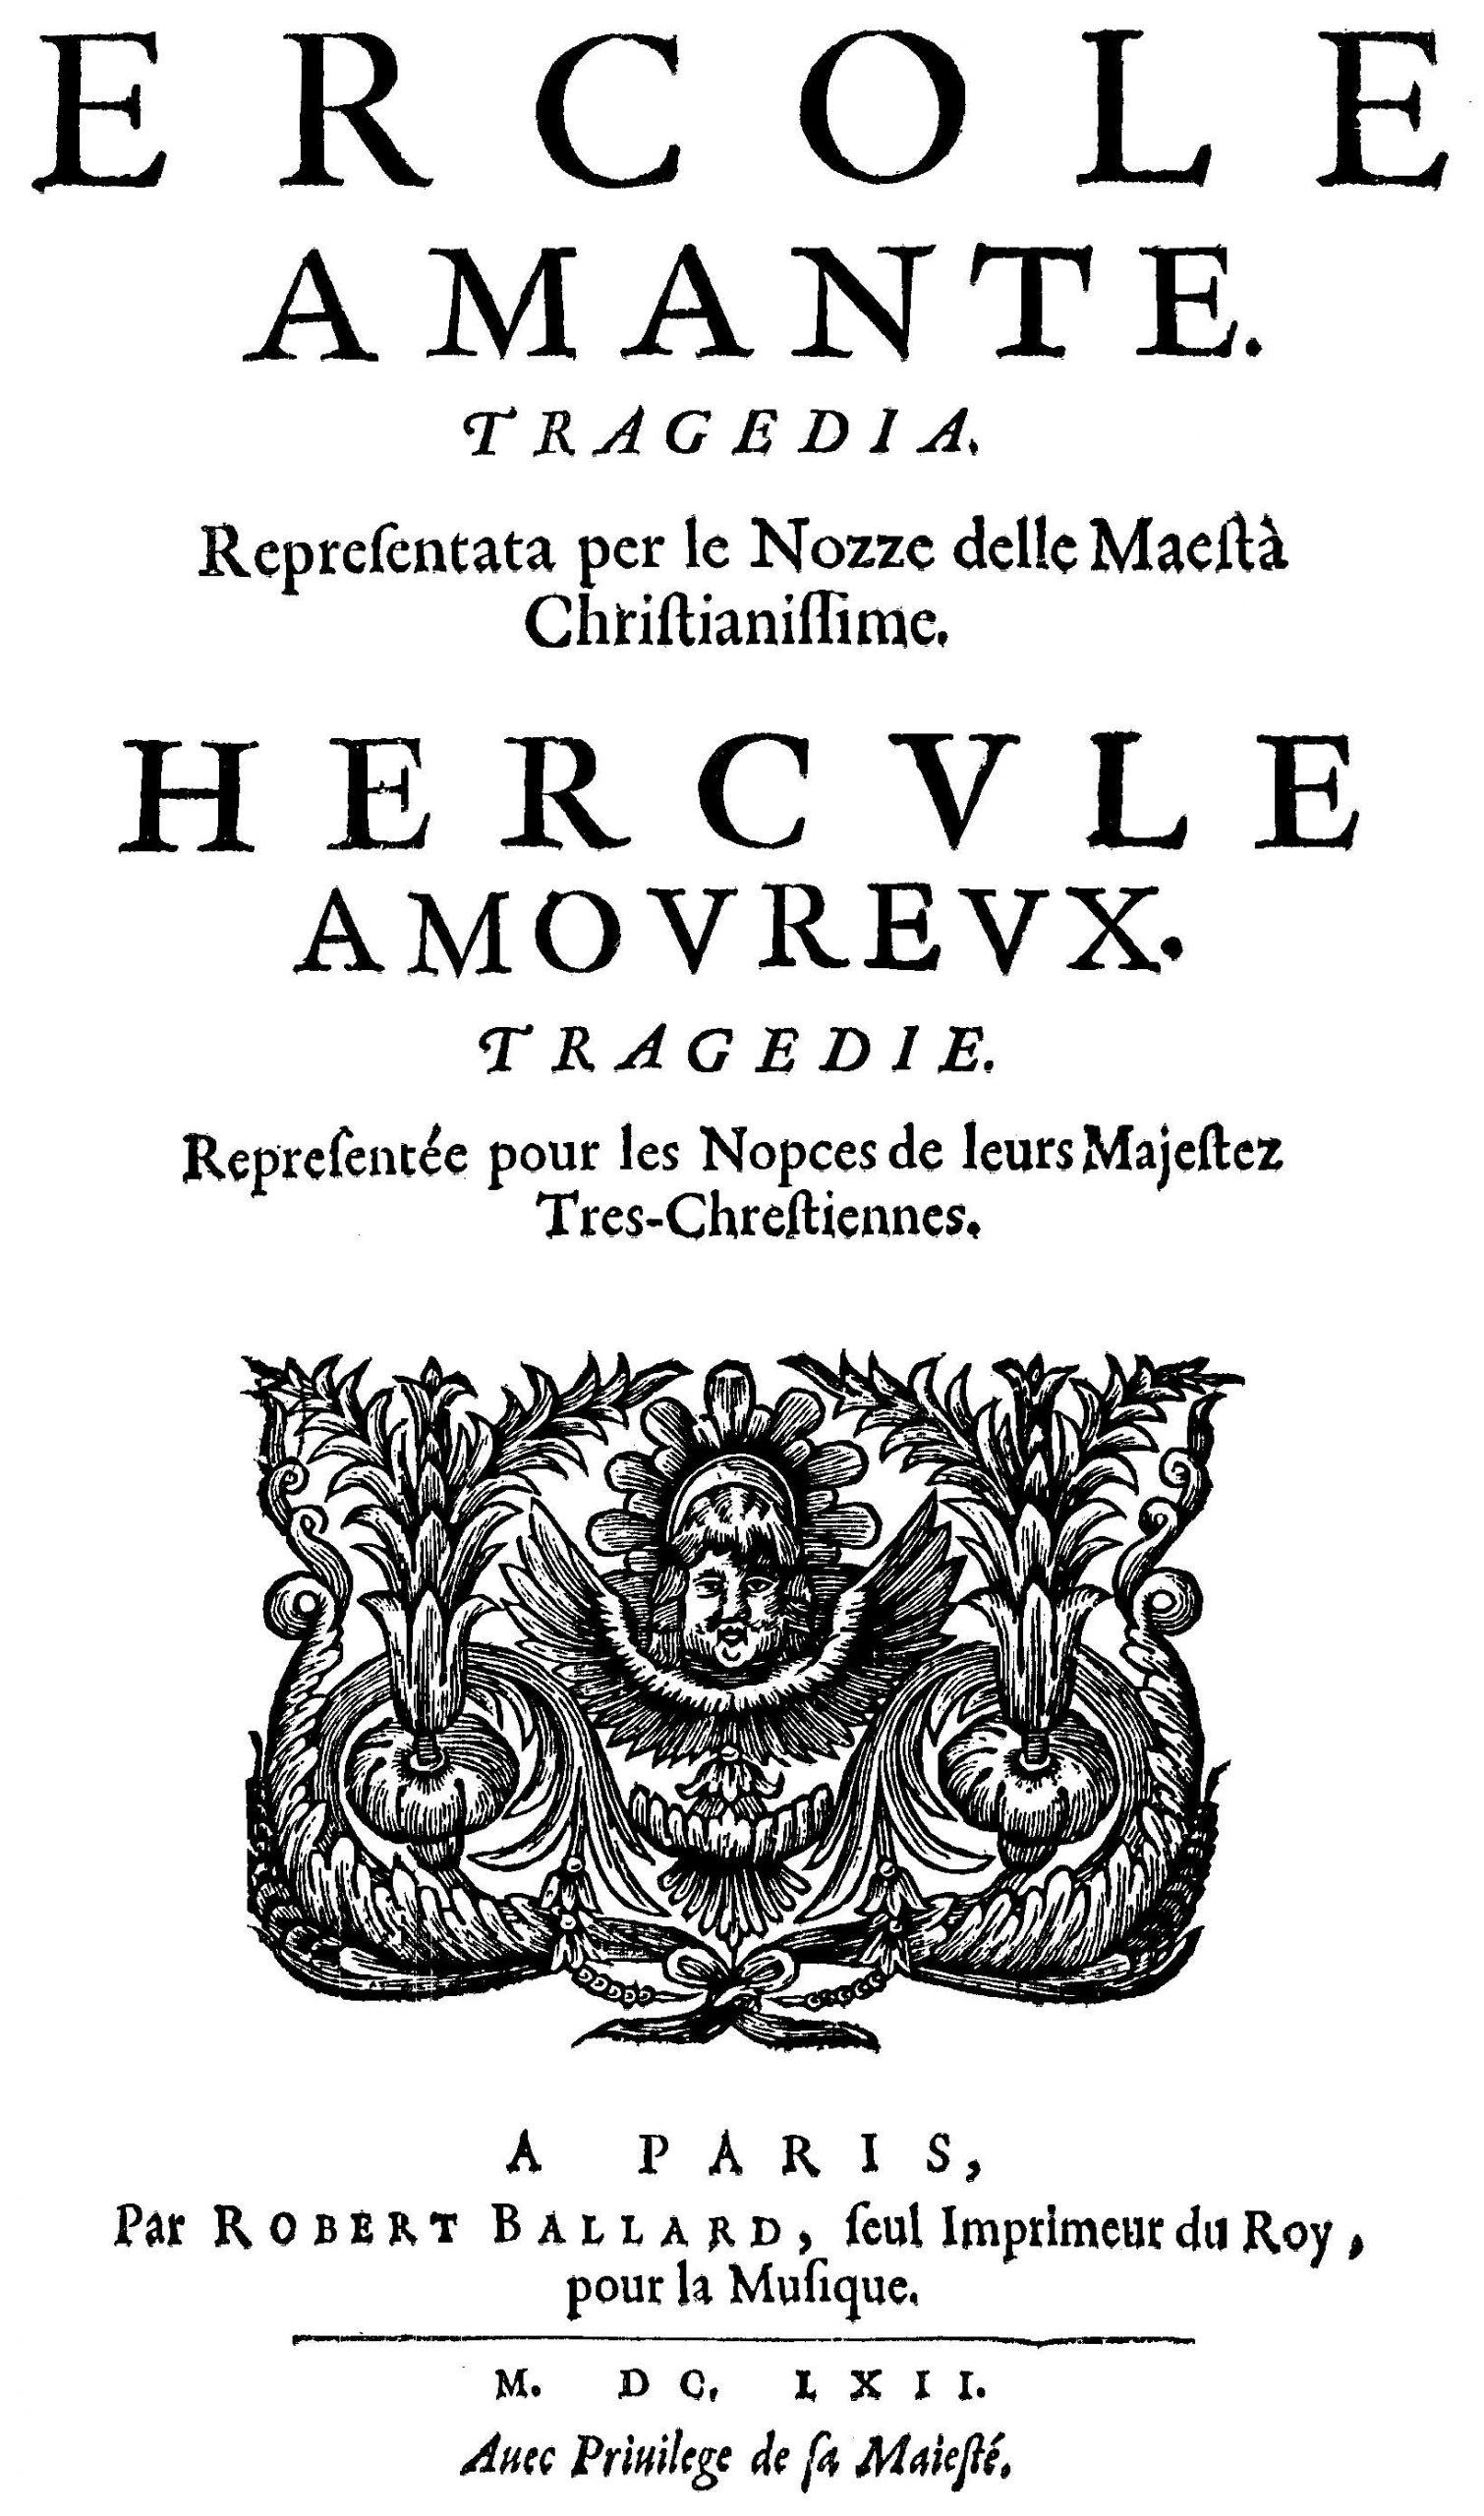 Francesco Cavalli Ercole amante title page of the libretto Paris 1662